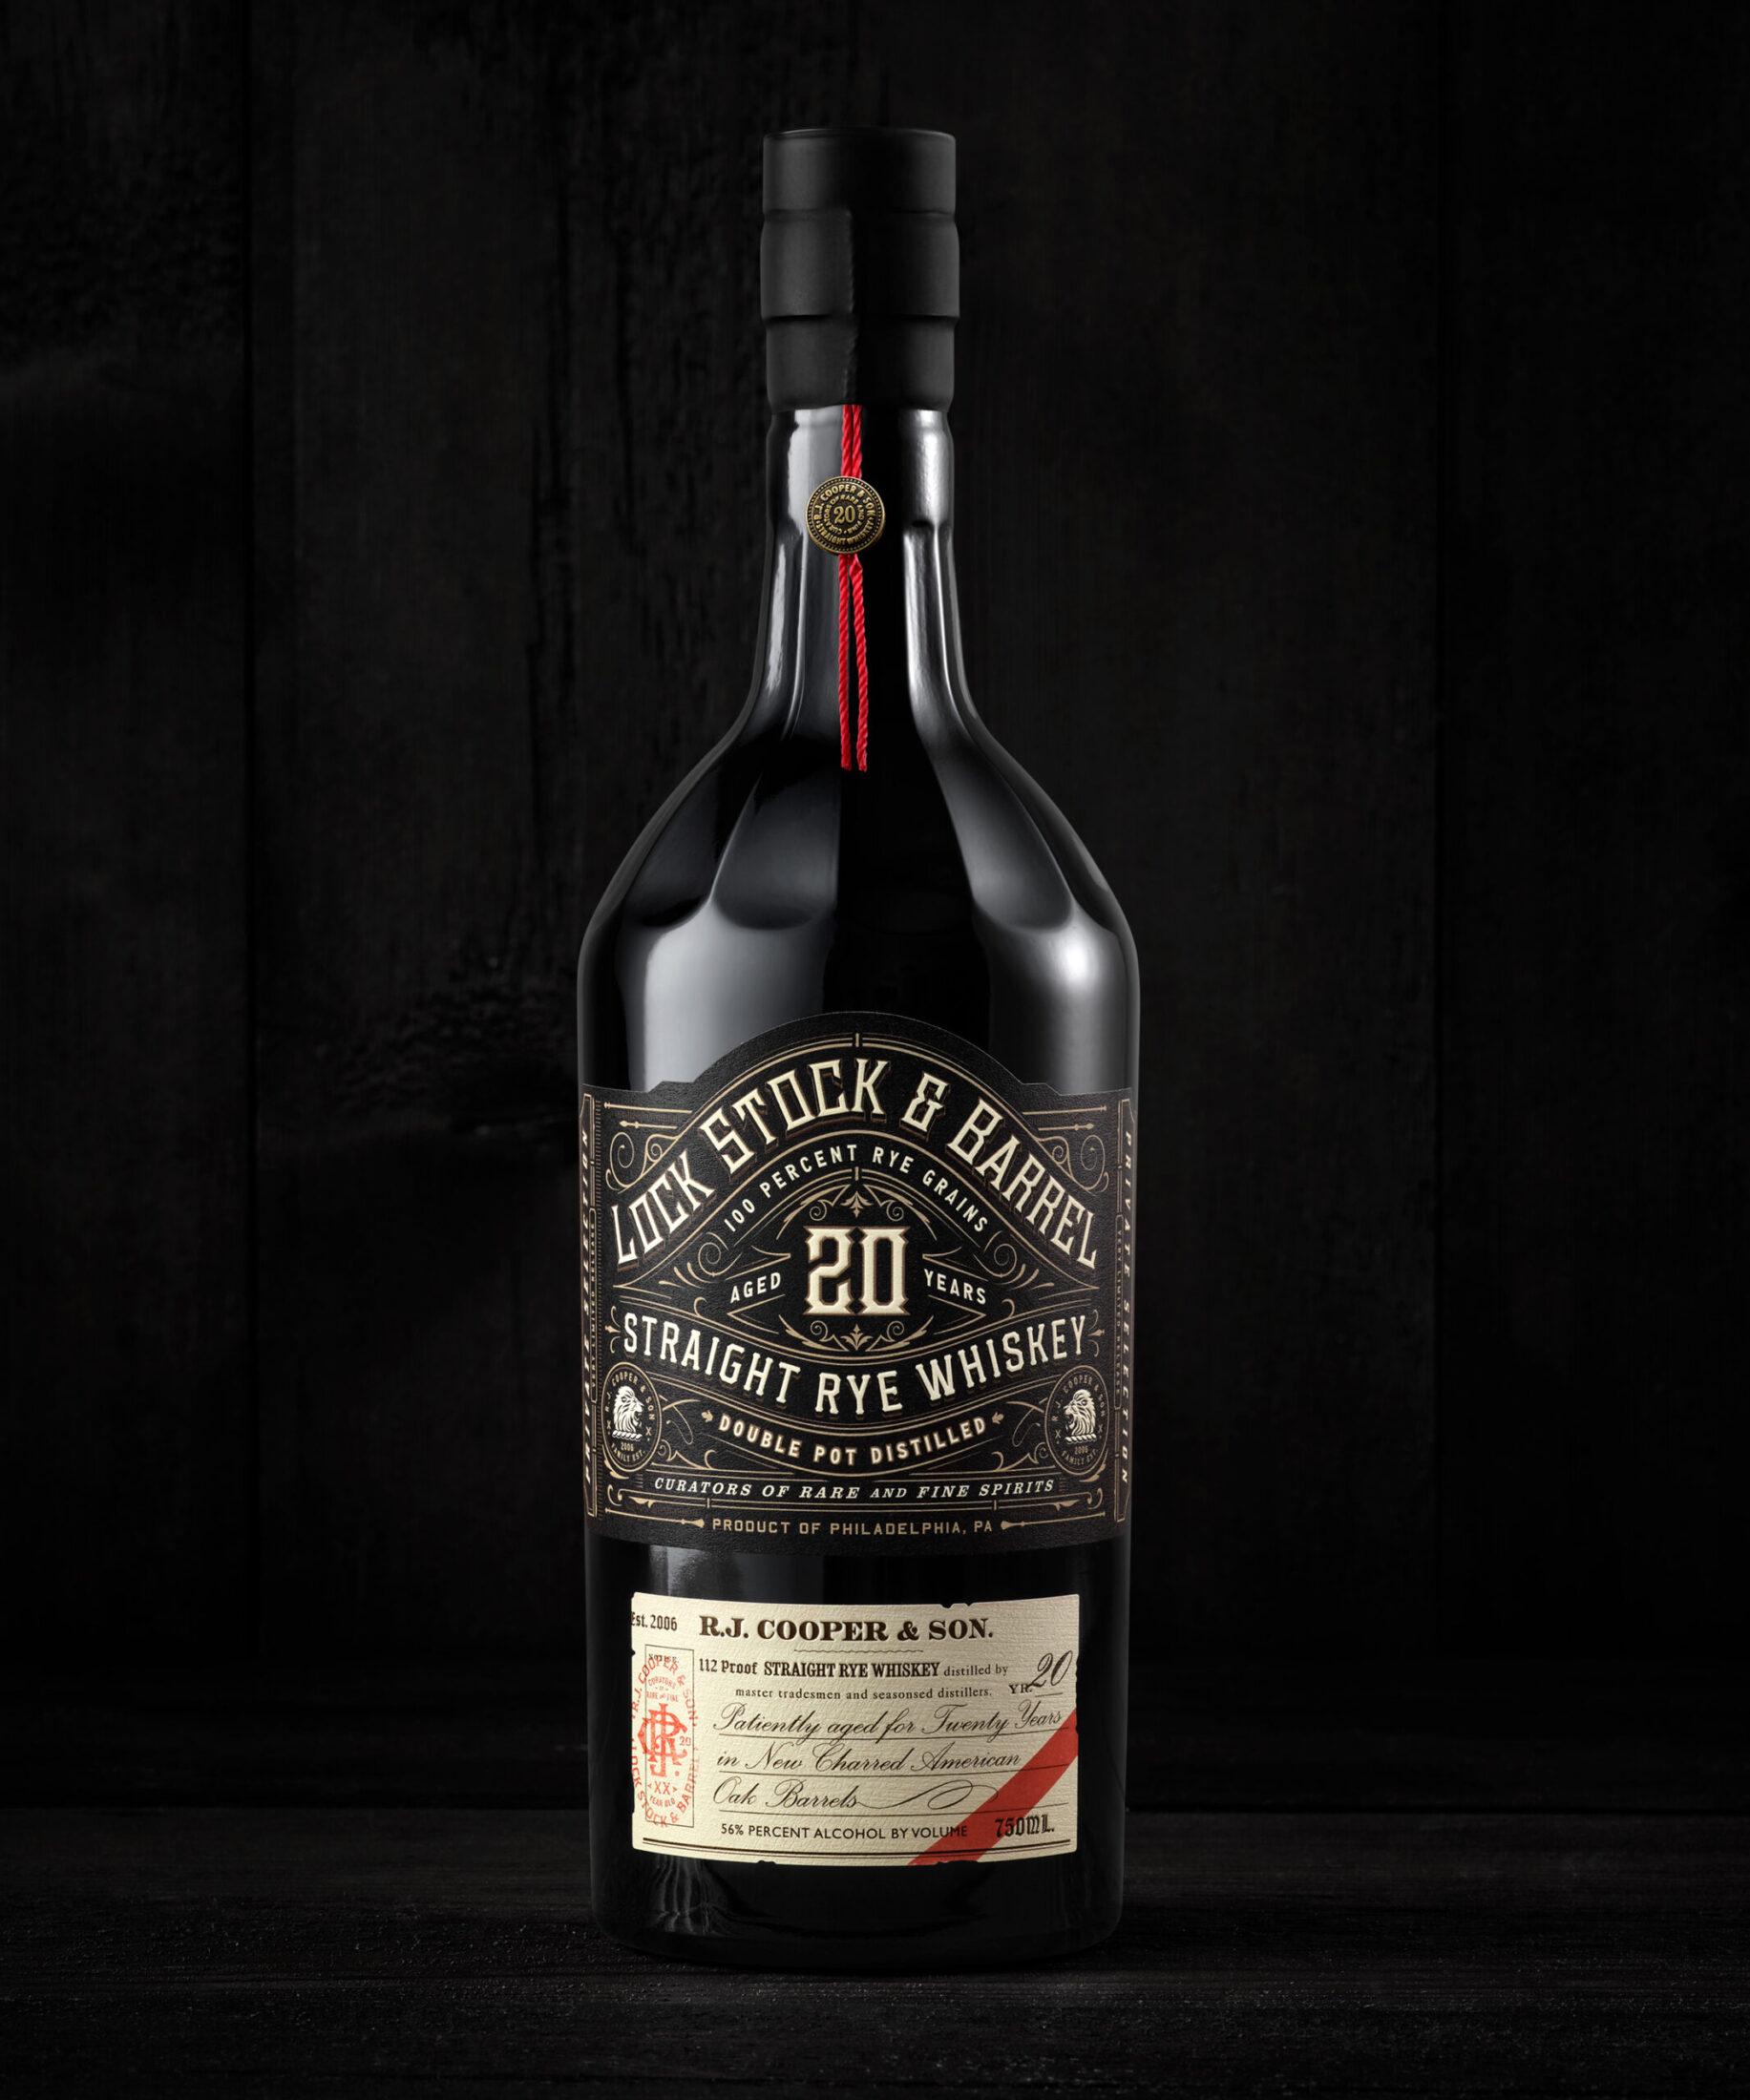 Lock Stock & Barrel 20 year whiskey